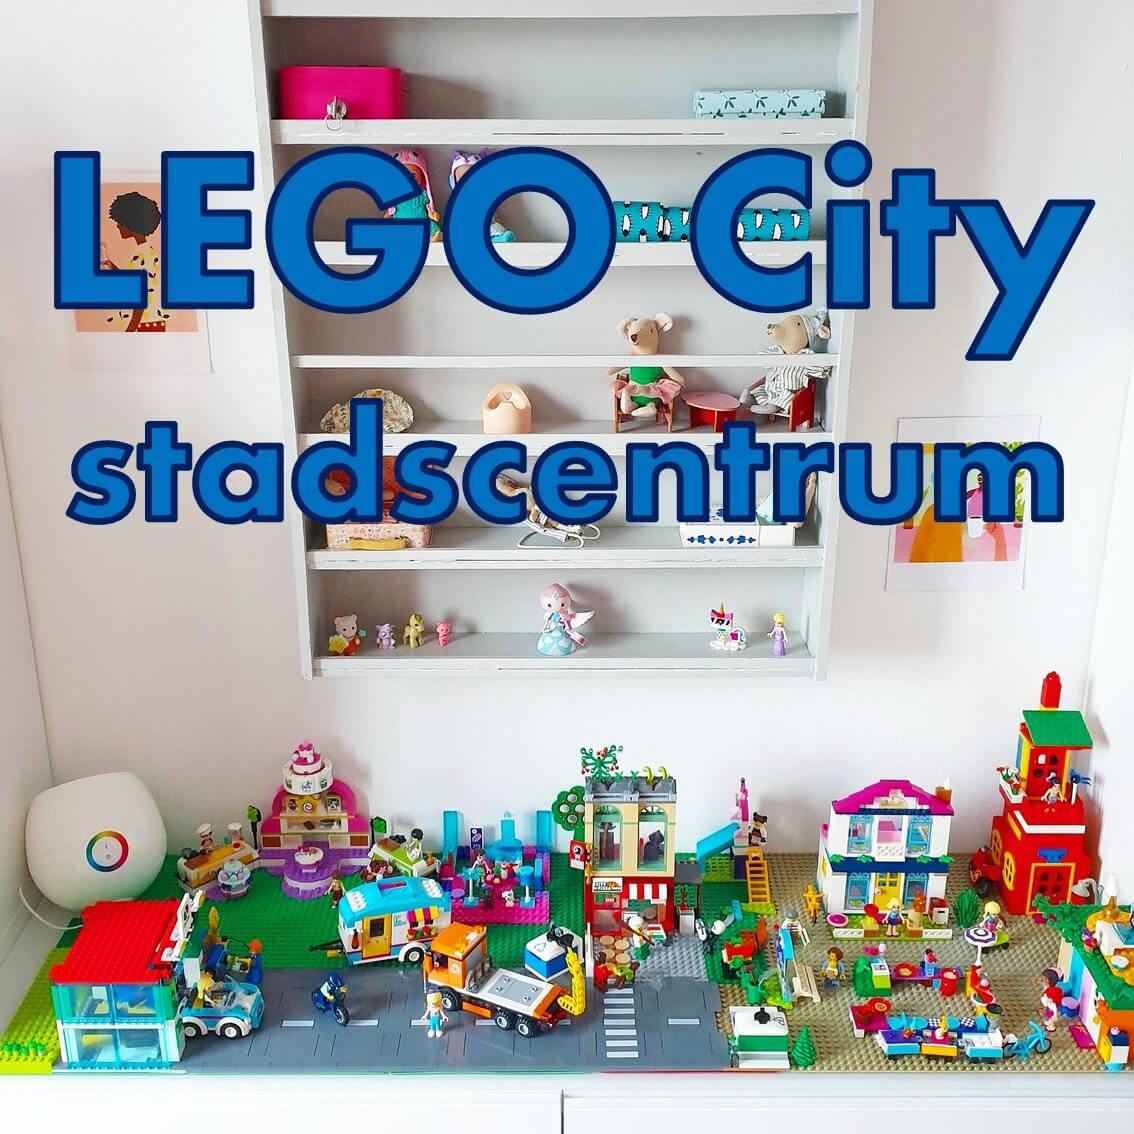 LEGO City stadscentrum 60292 (16)